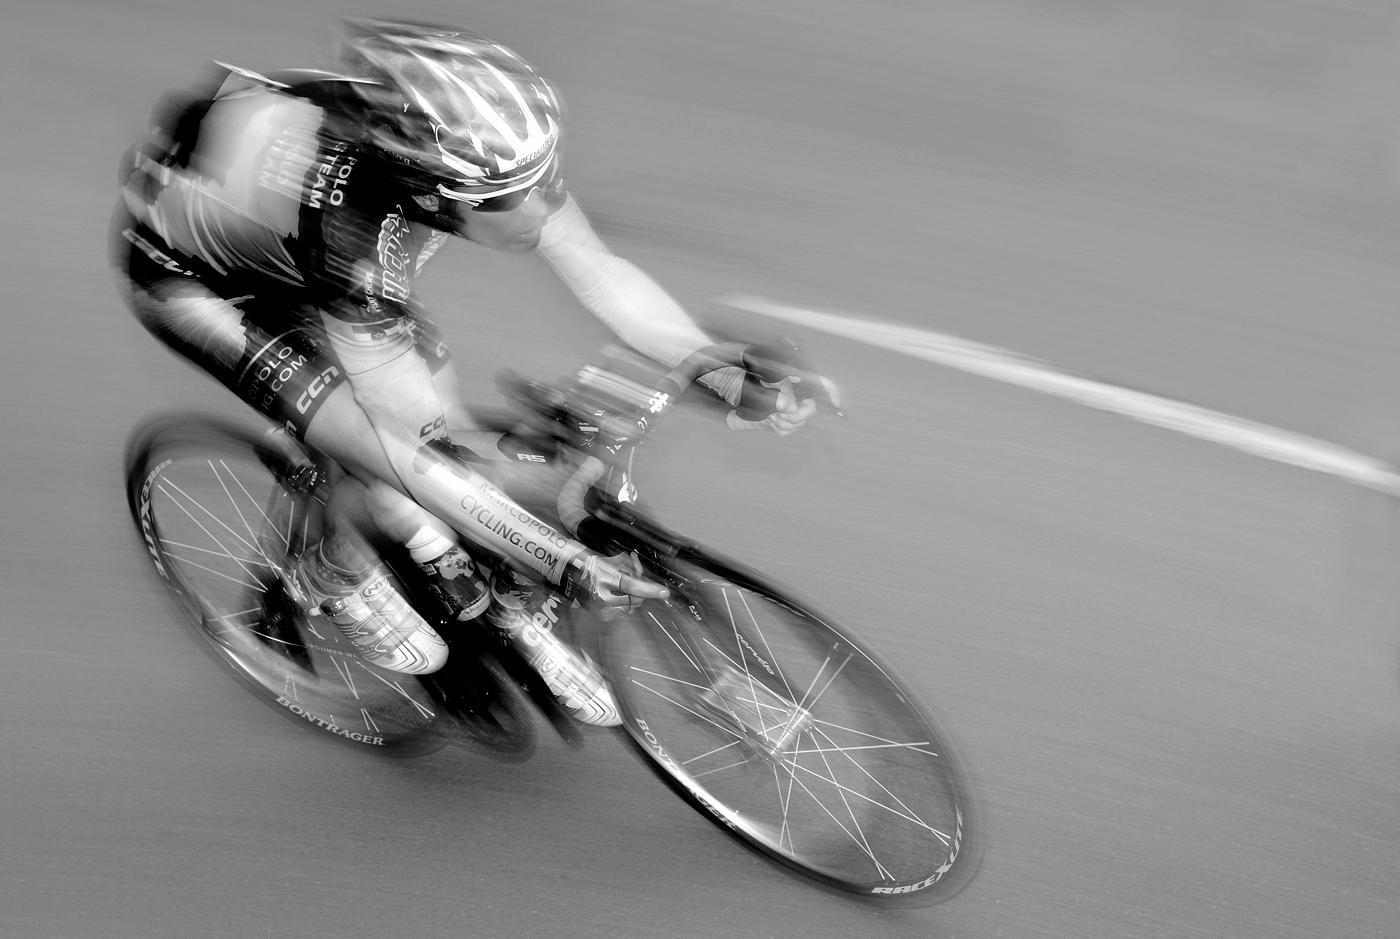 Annahme:  Radsport  | ©  Rainer Busch